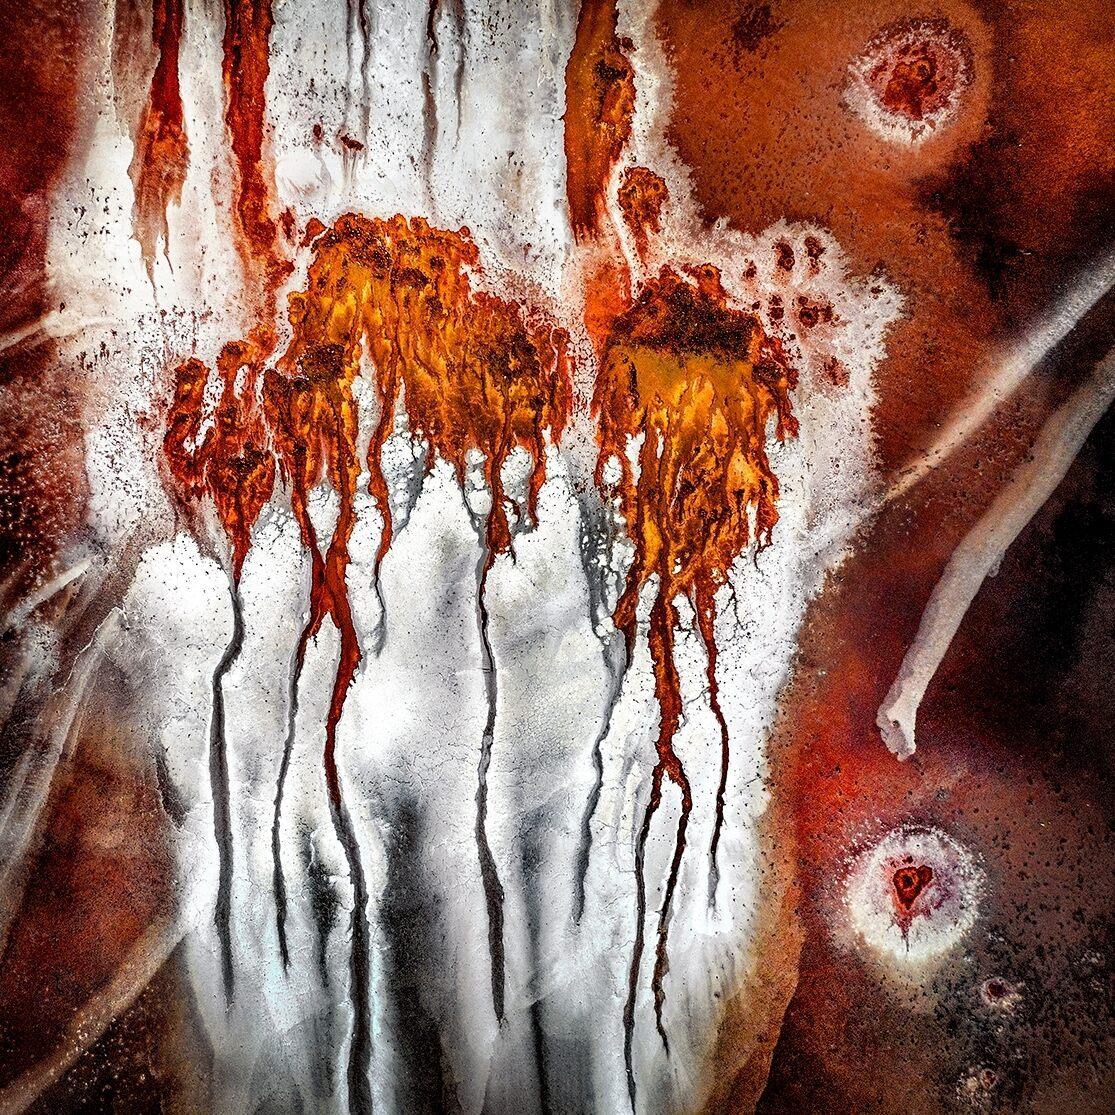 Iron-rich springs at Australia's Lake Tyrrell provide intense color in <em>Heart of the Salt Lake.</em>